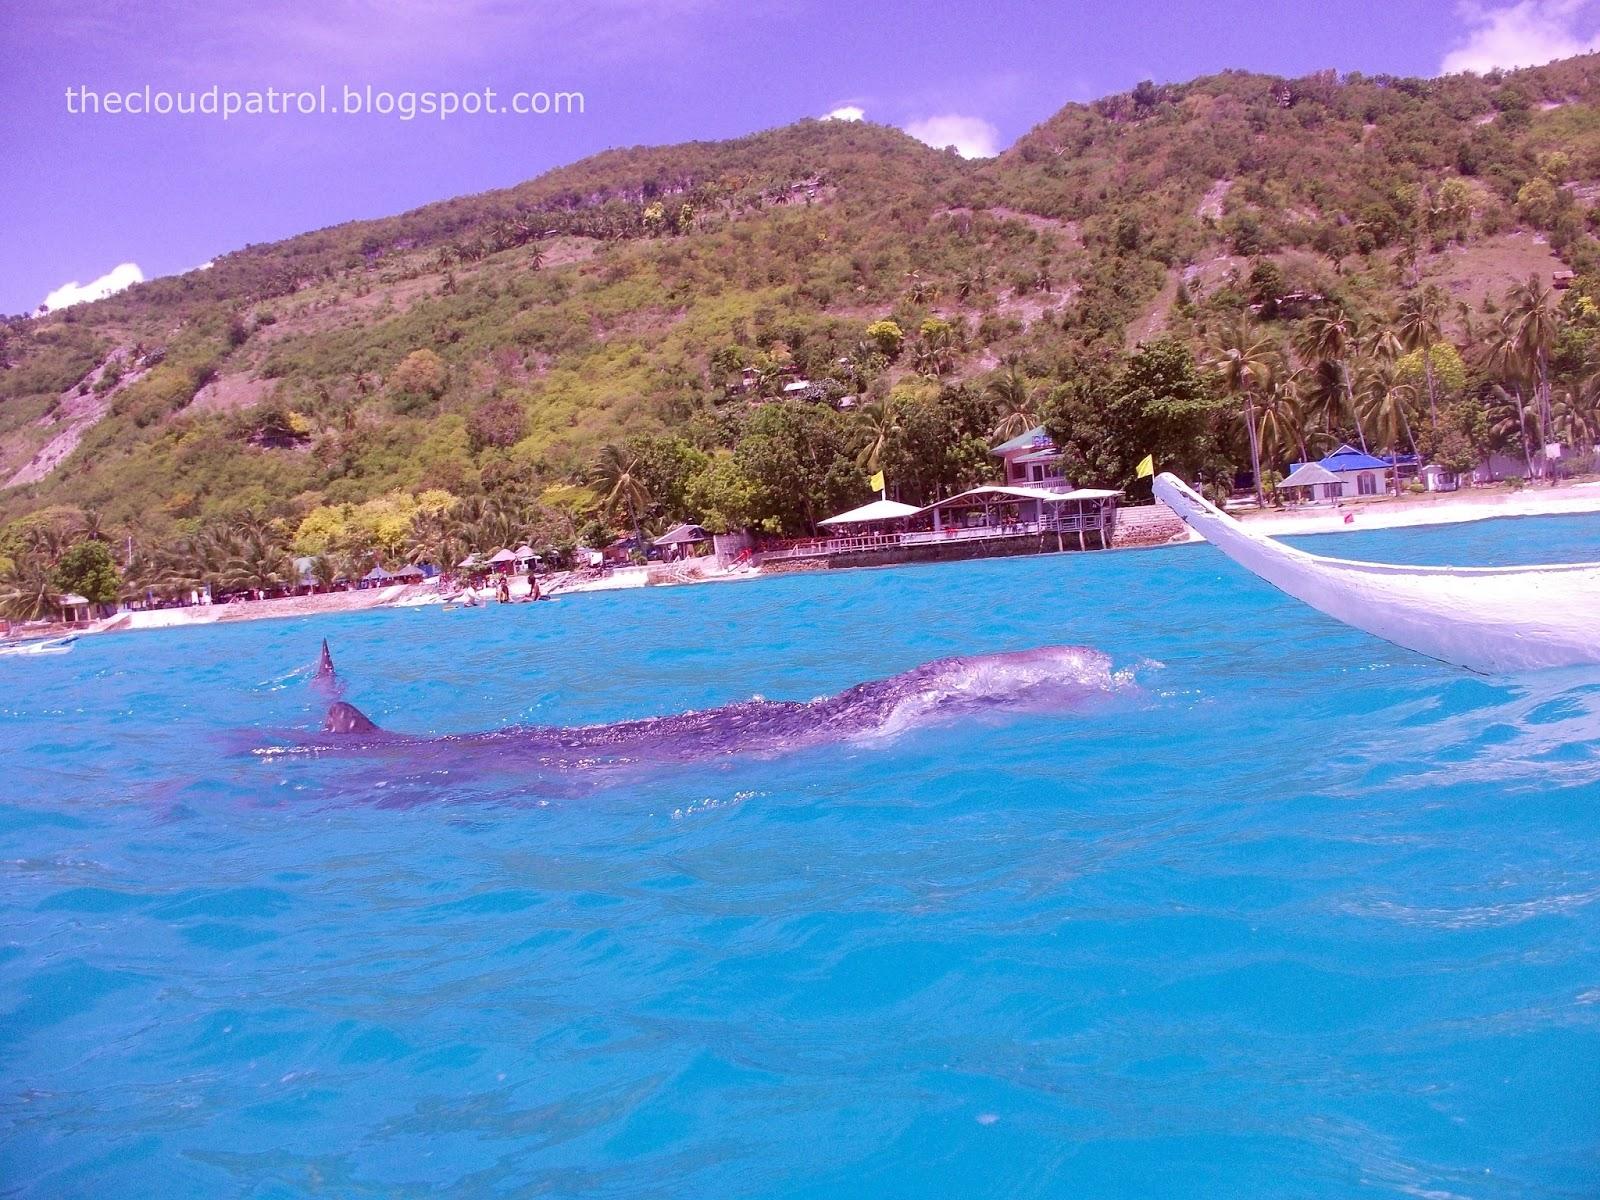 Butanding, whale shark, cebu, oslob, philippines, watchig, swimming, beach